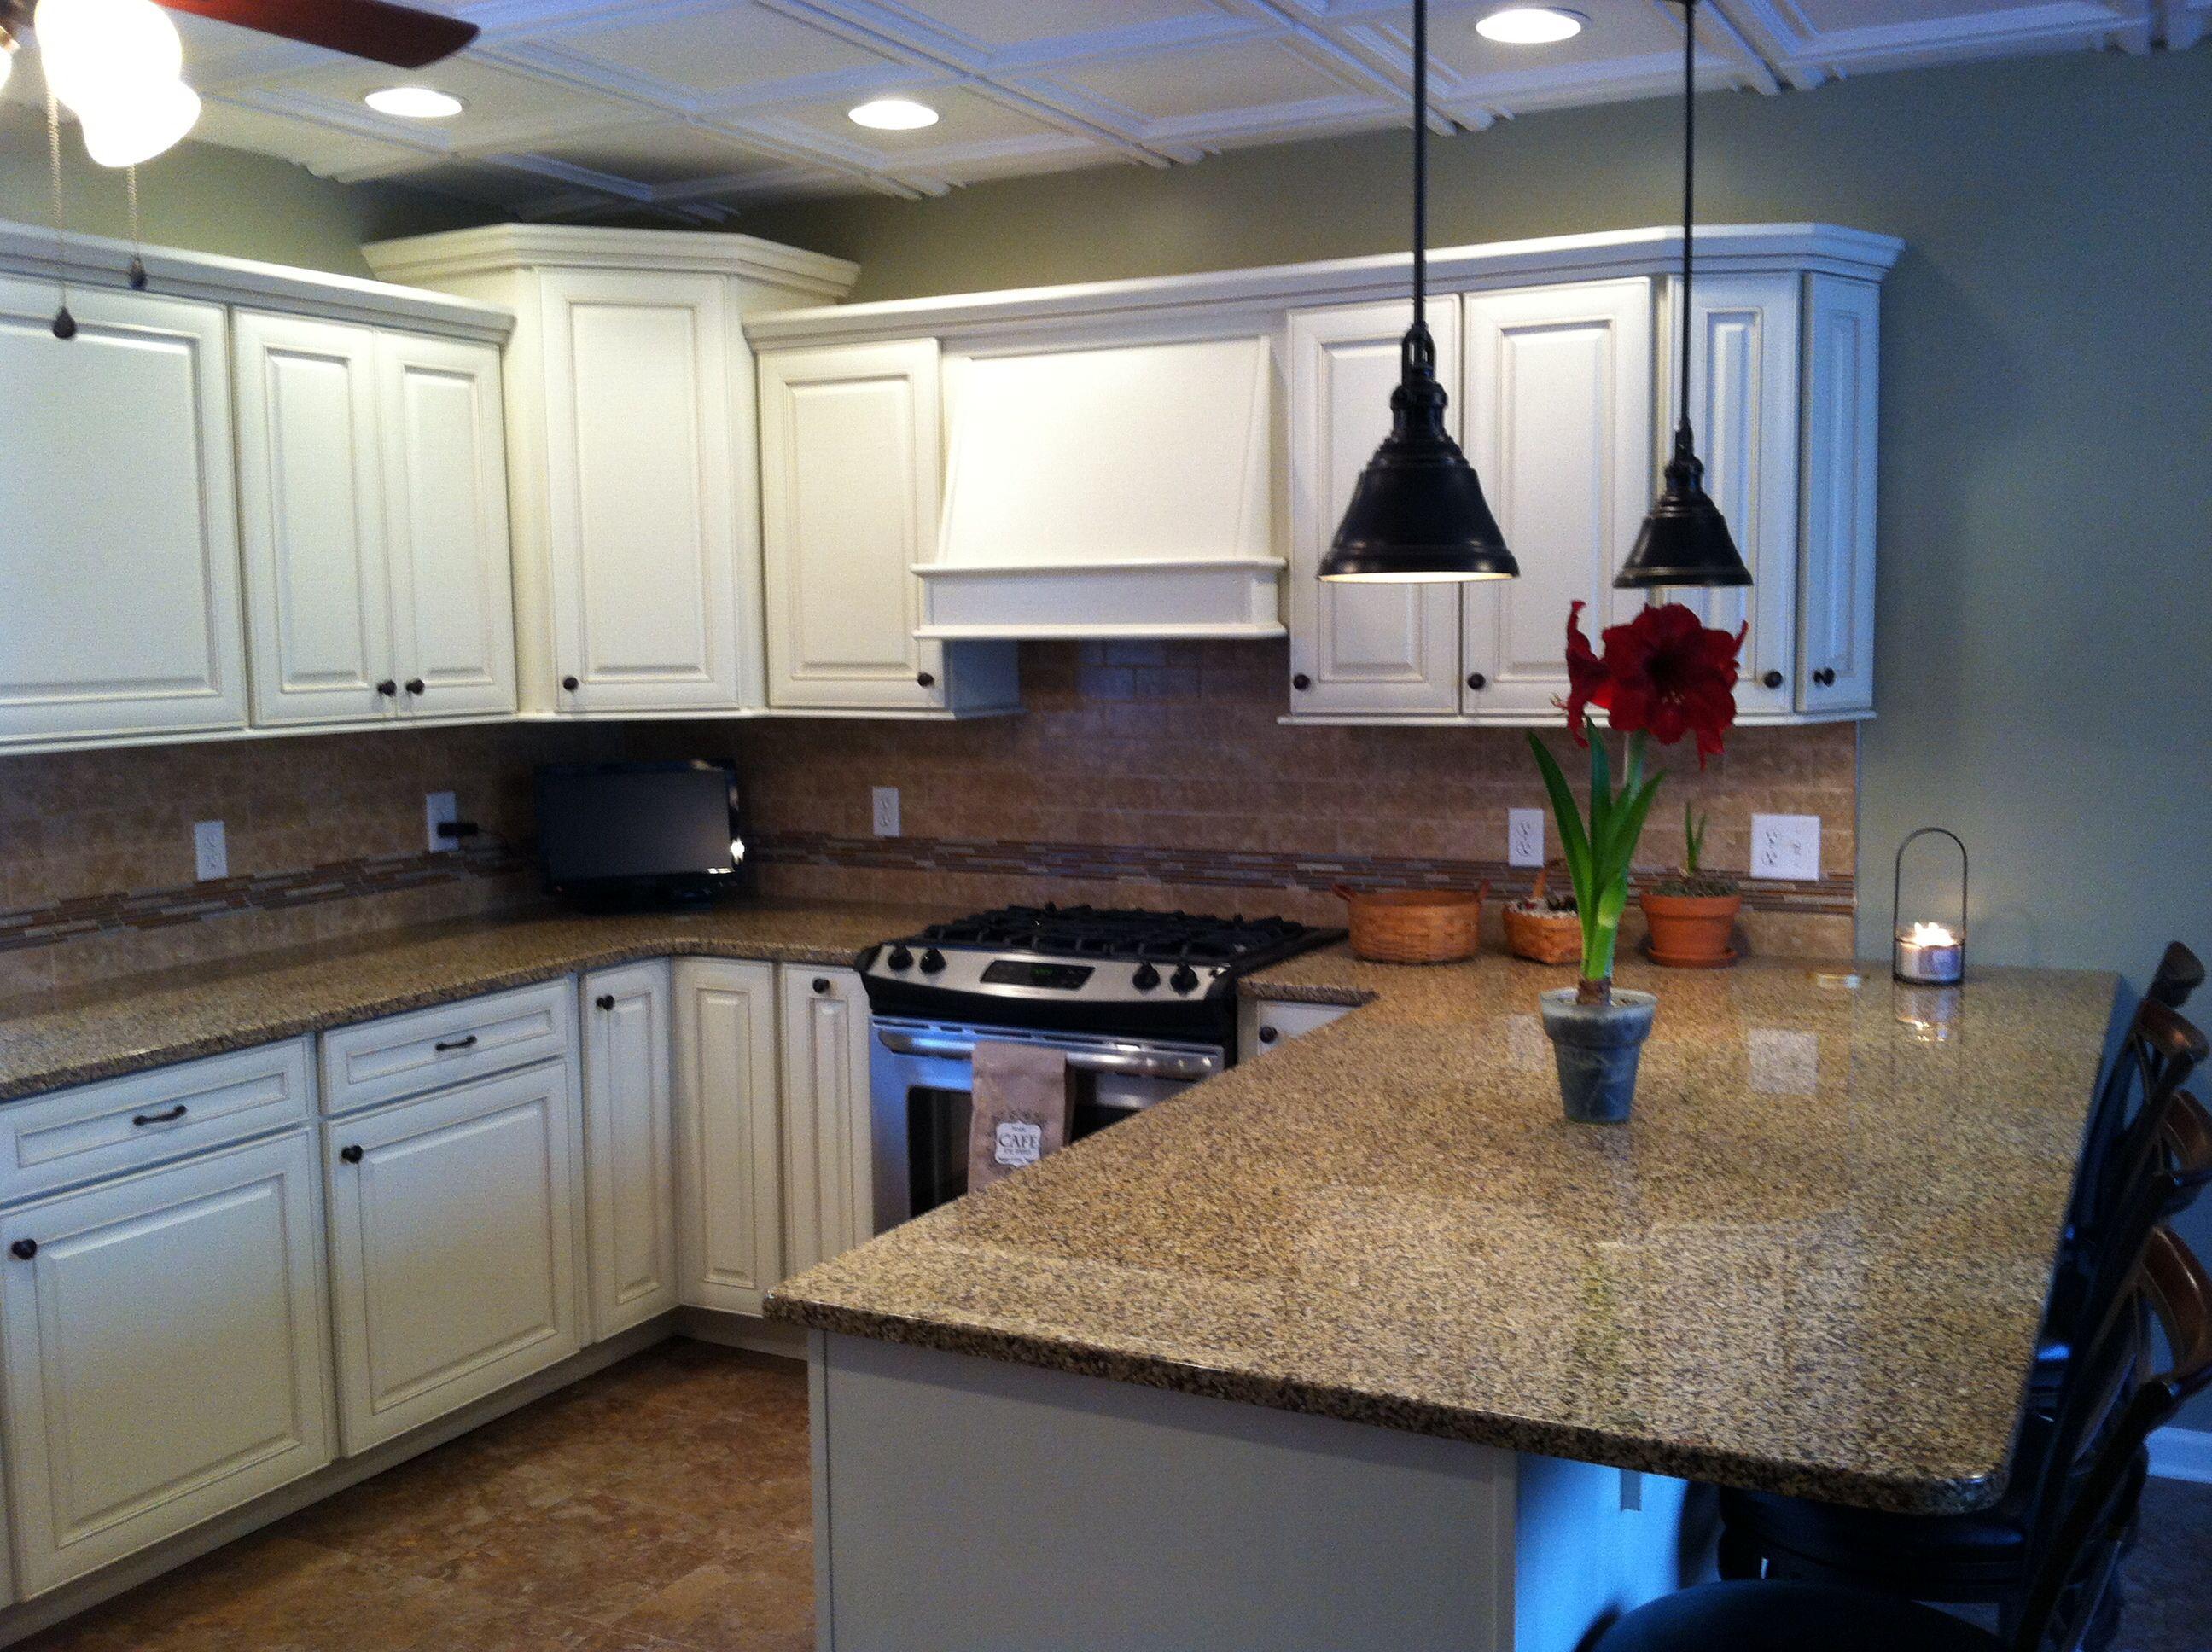 Antique white kitchen cabinetry Norcraft | KITCHEN REMODEL IDEAS ...